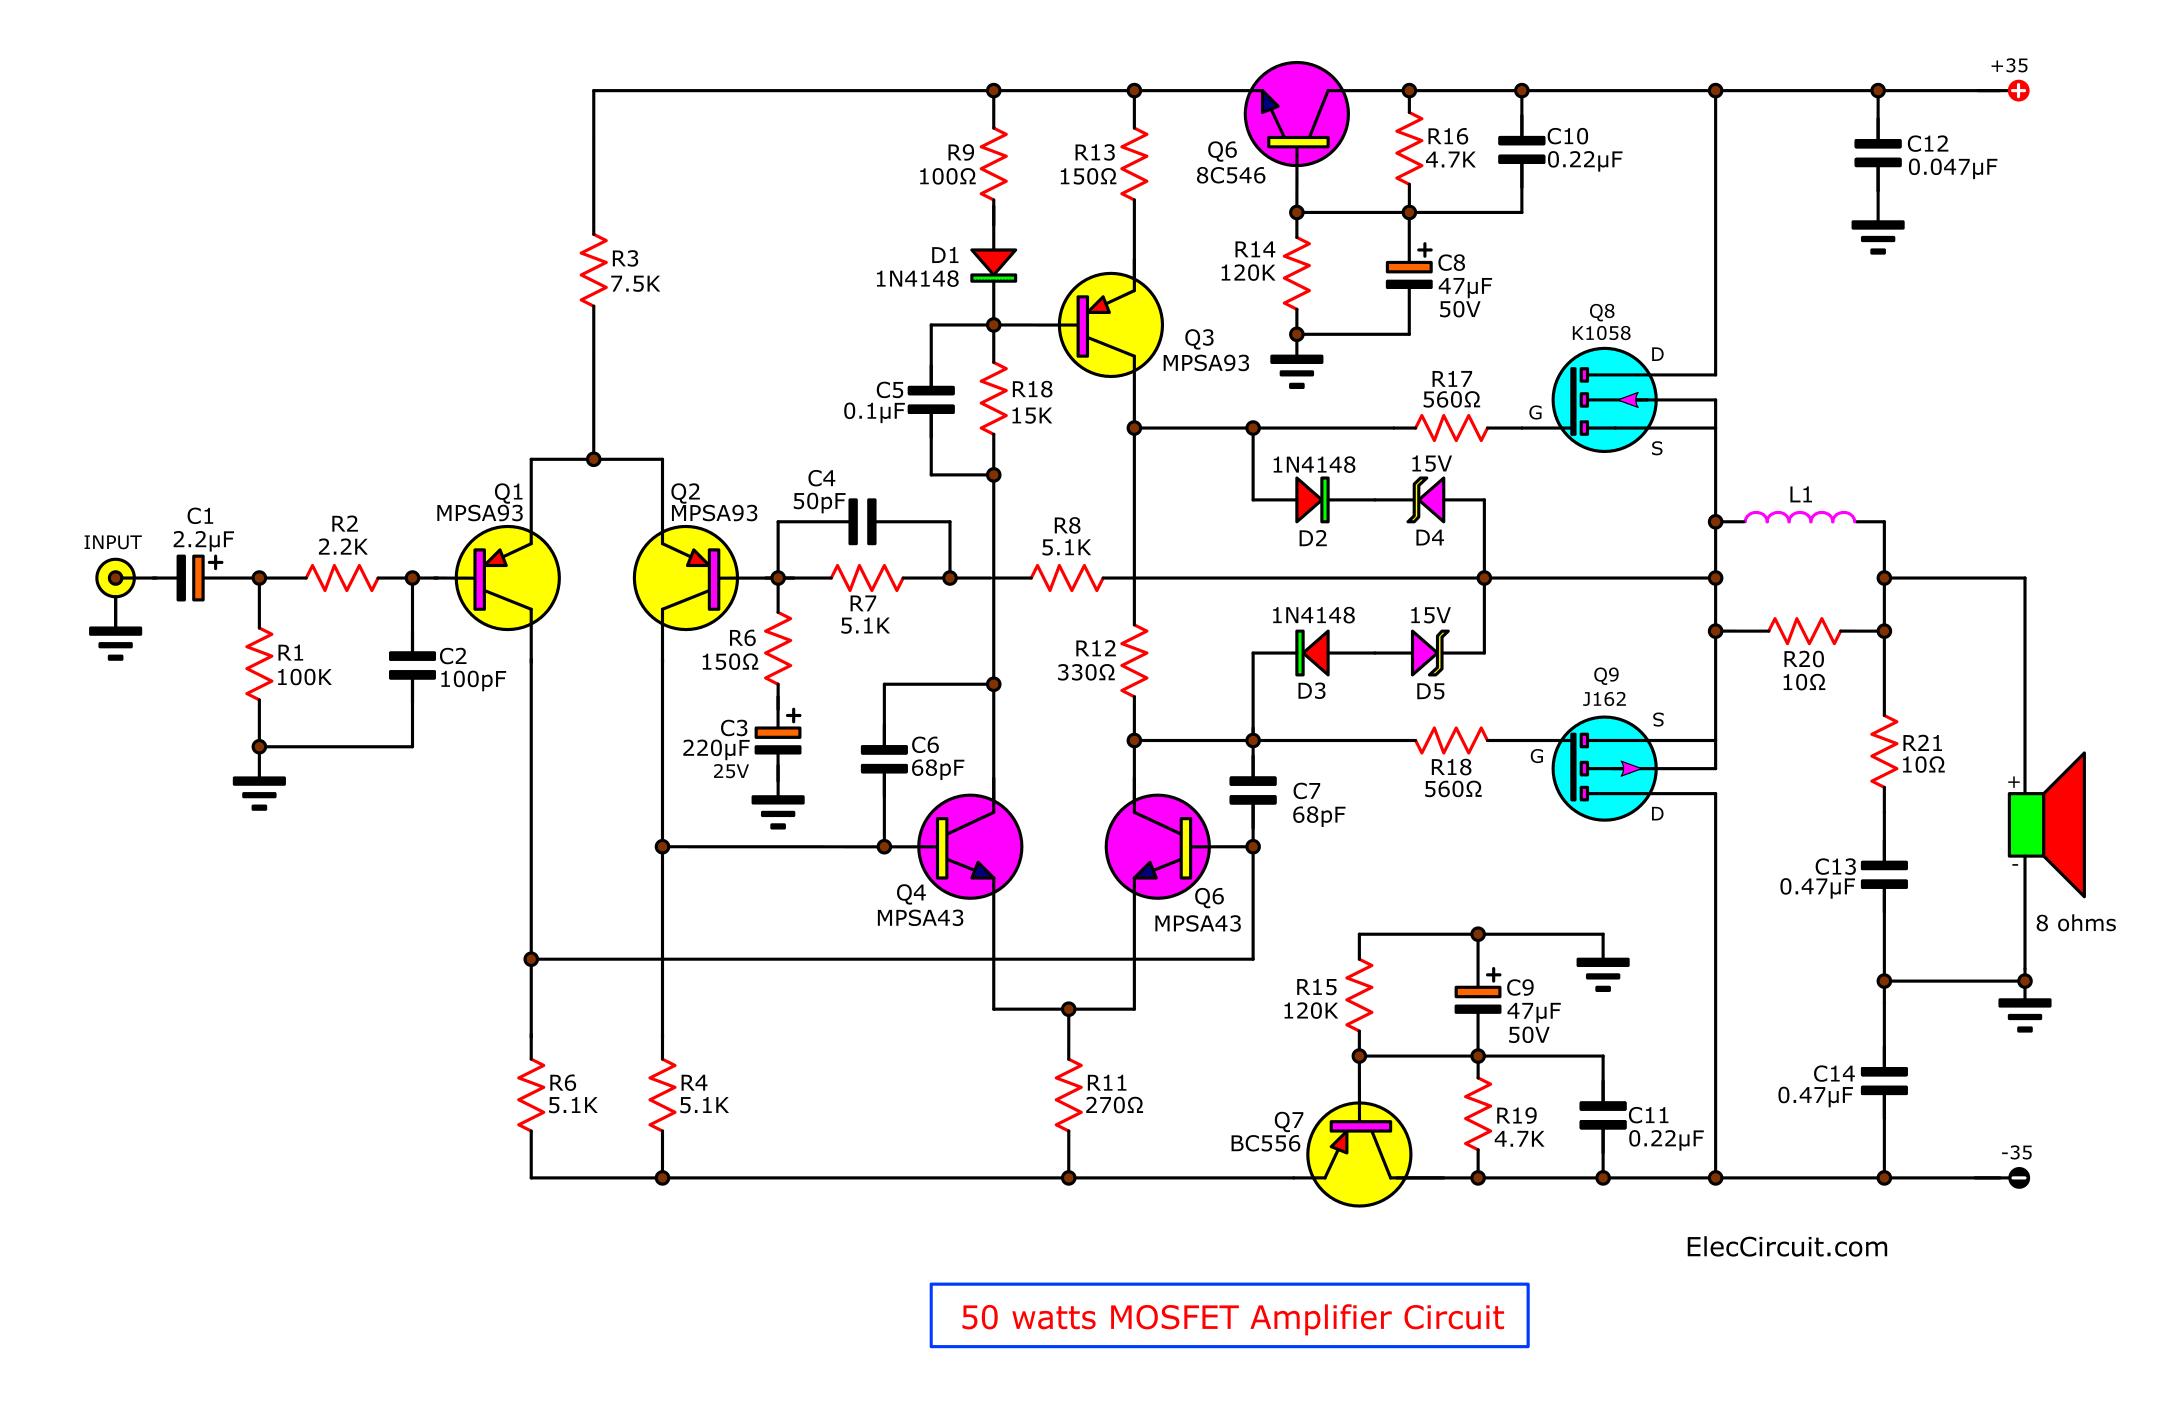 50w mosfet amplifier circuit ocl using k1058   j162